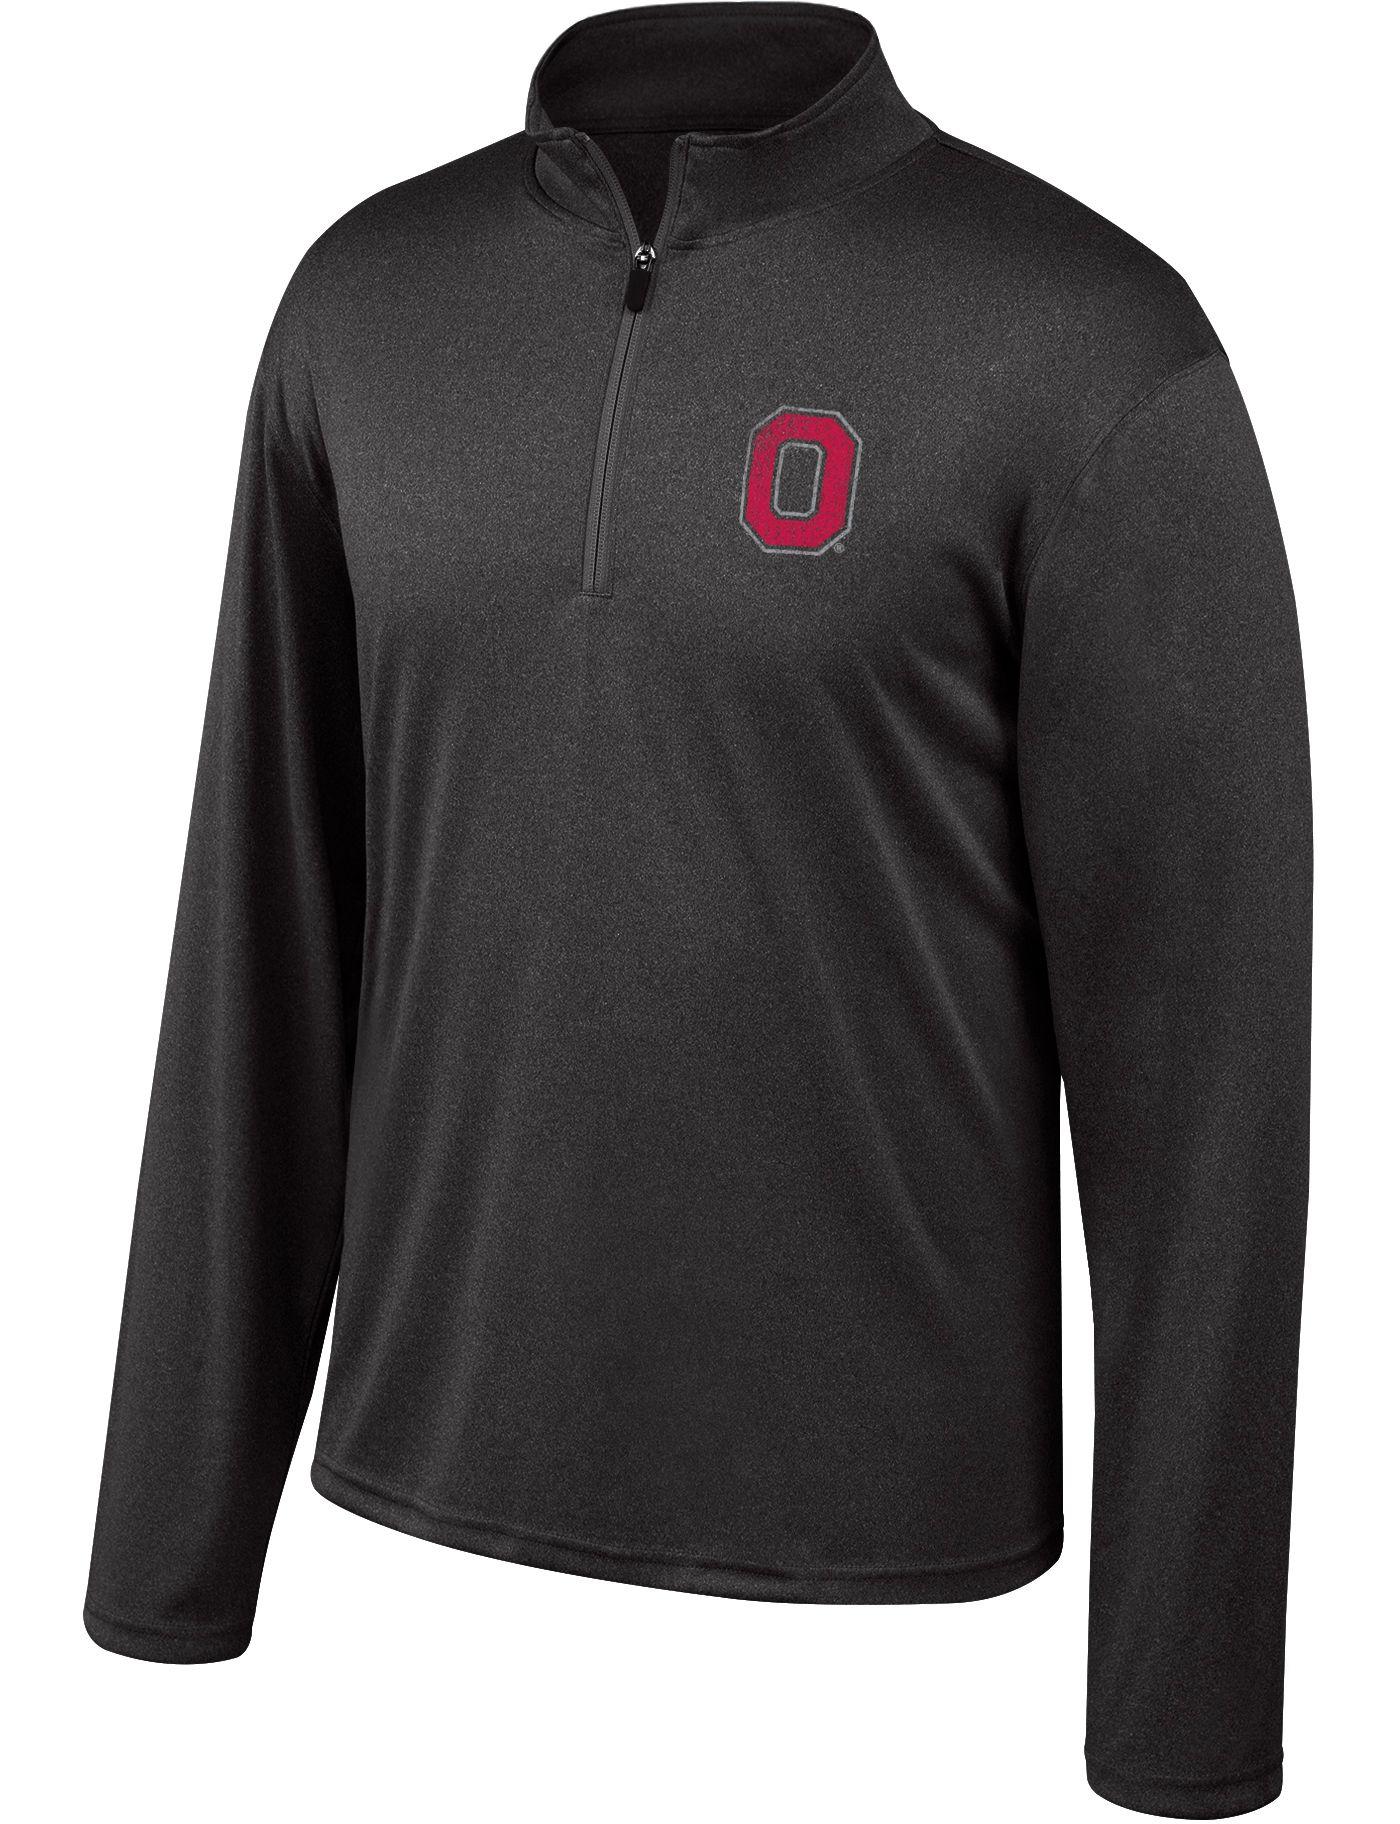 Scarlet & Gray Men's Ohio State Buckeyes Quarter-Zip Black Shirt